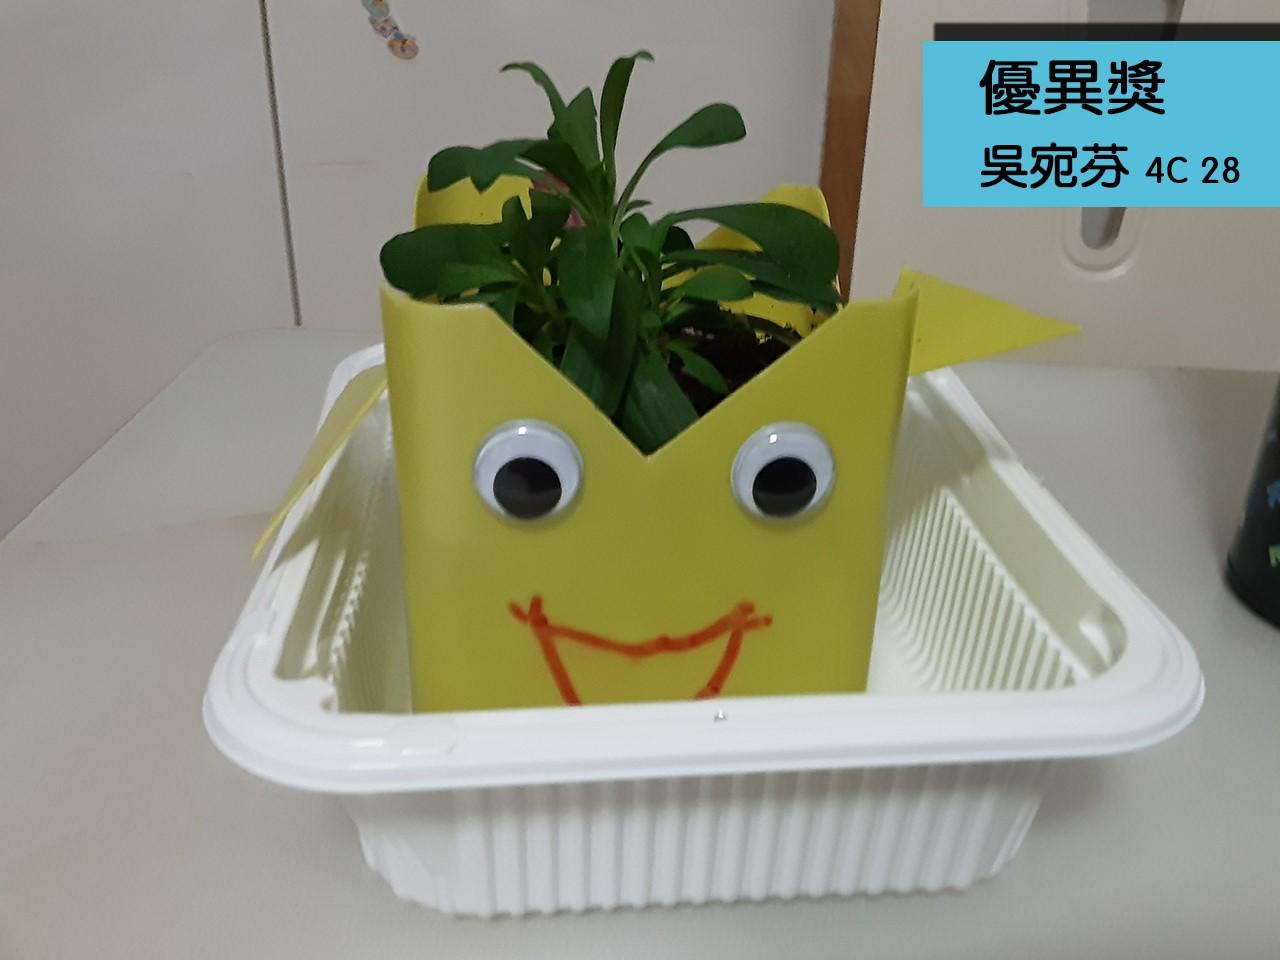 https://plkcjy.edu.hk/sites/default/files/you_yi_jiang_99_4c_28_wu_wan_fen_.jpg